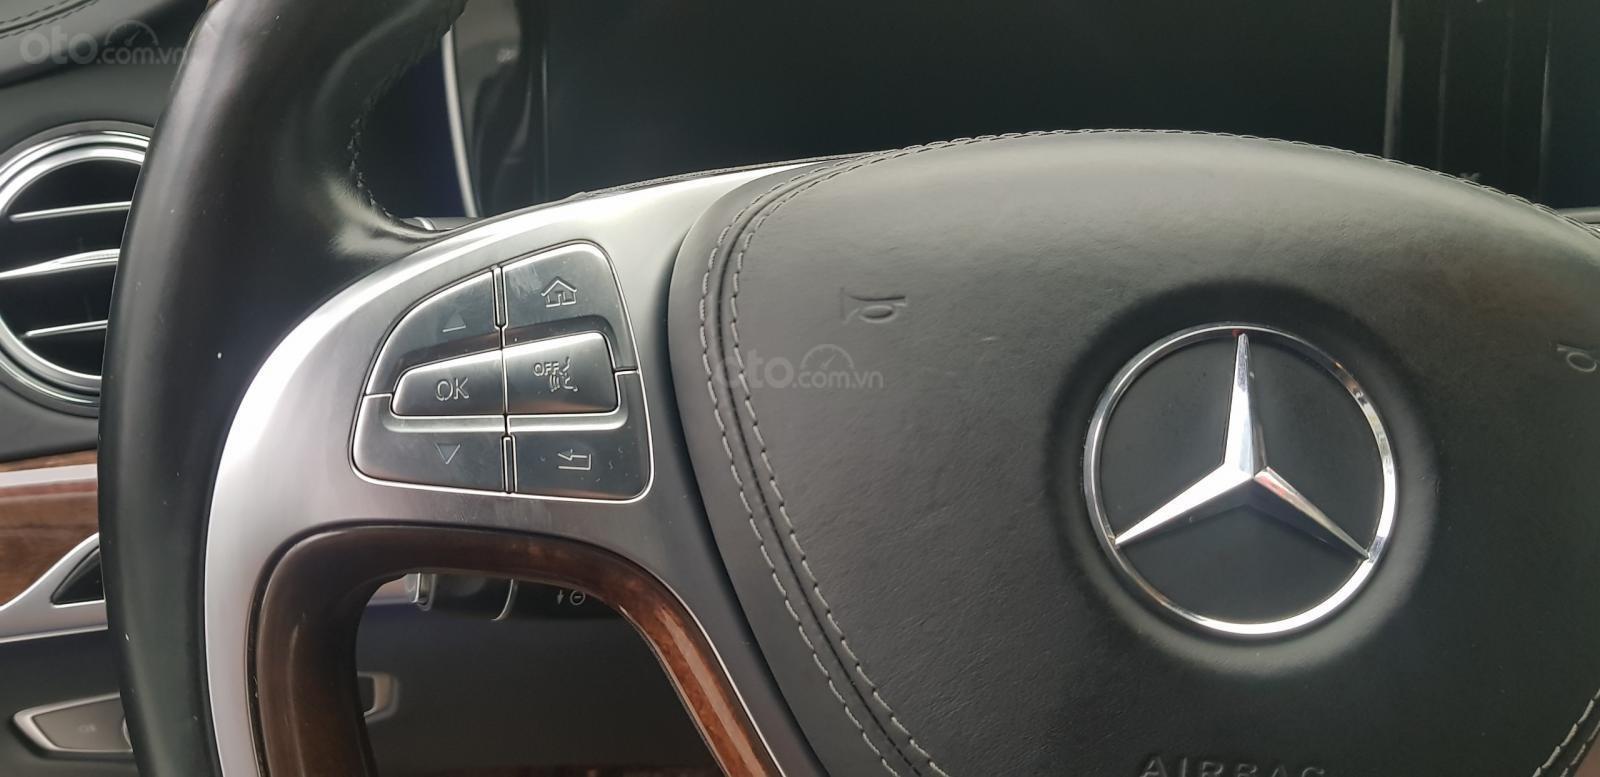 Bán Mercedes-Benz S500 SX 2016 màu đen, LH Ms  Hương 094.539.2468 (19)